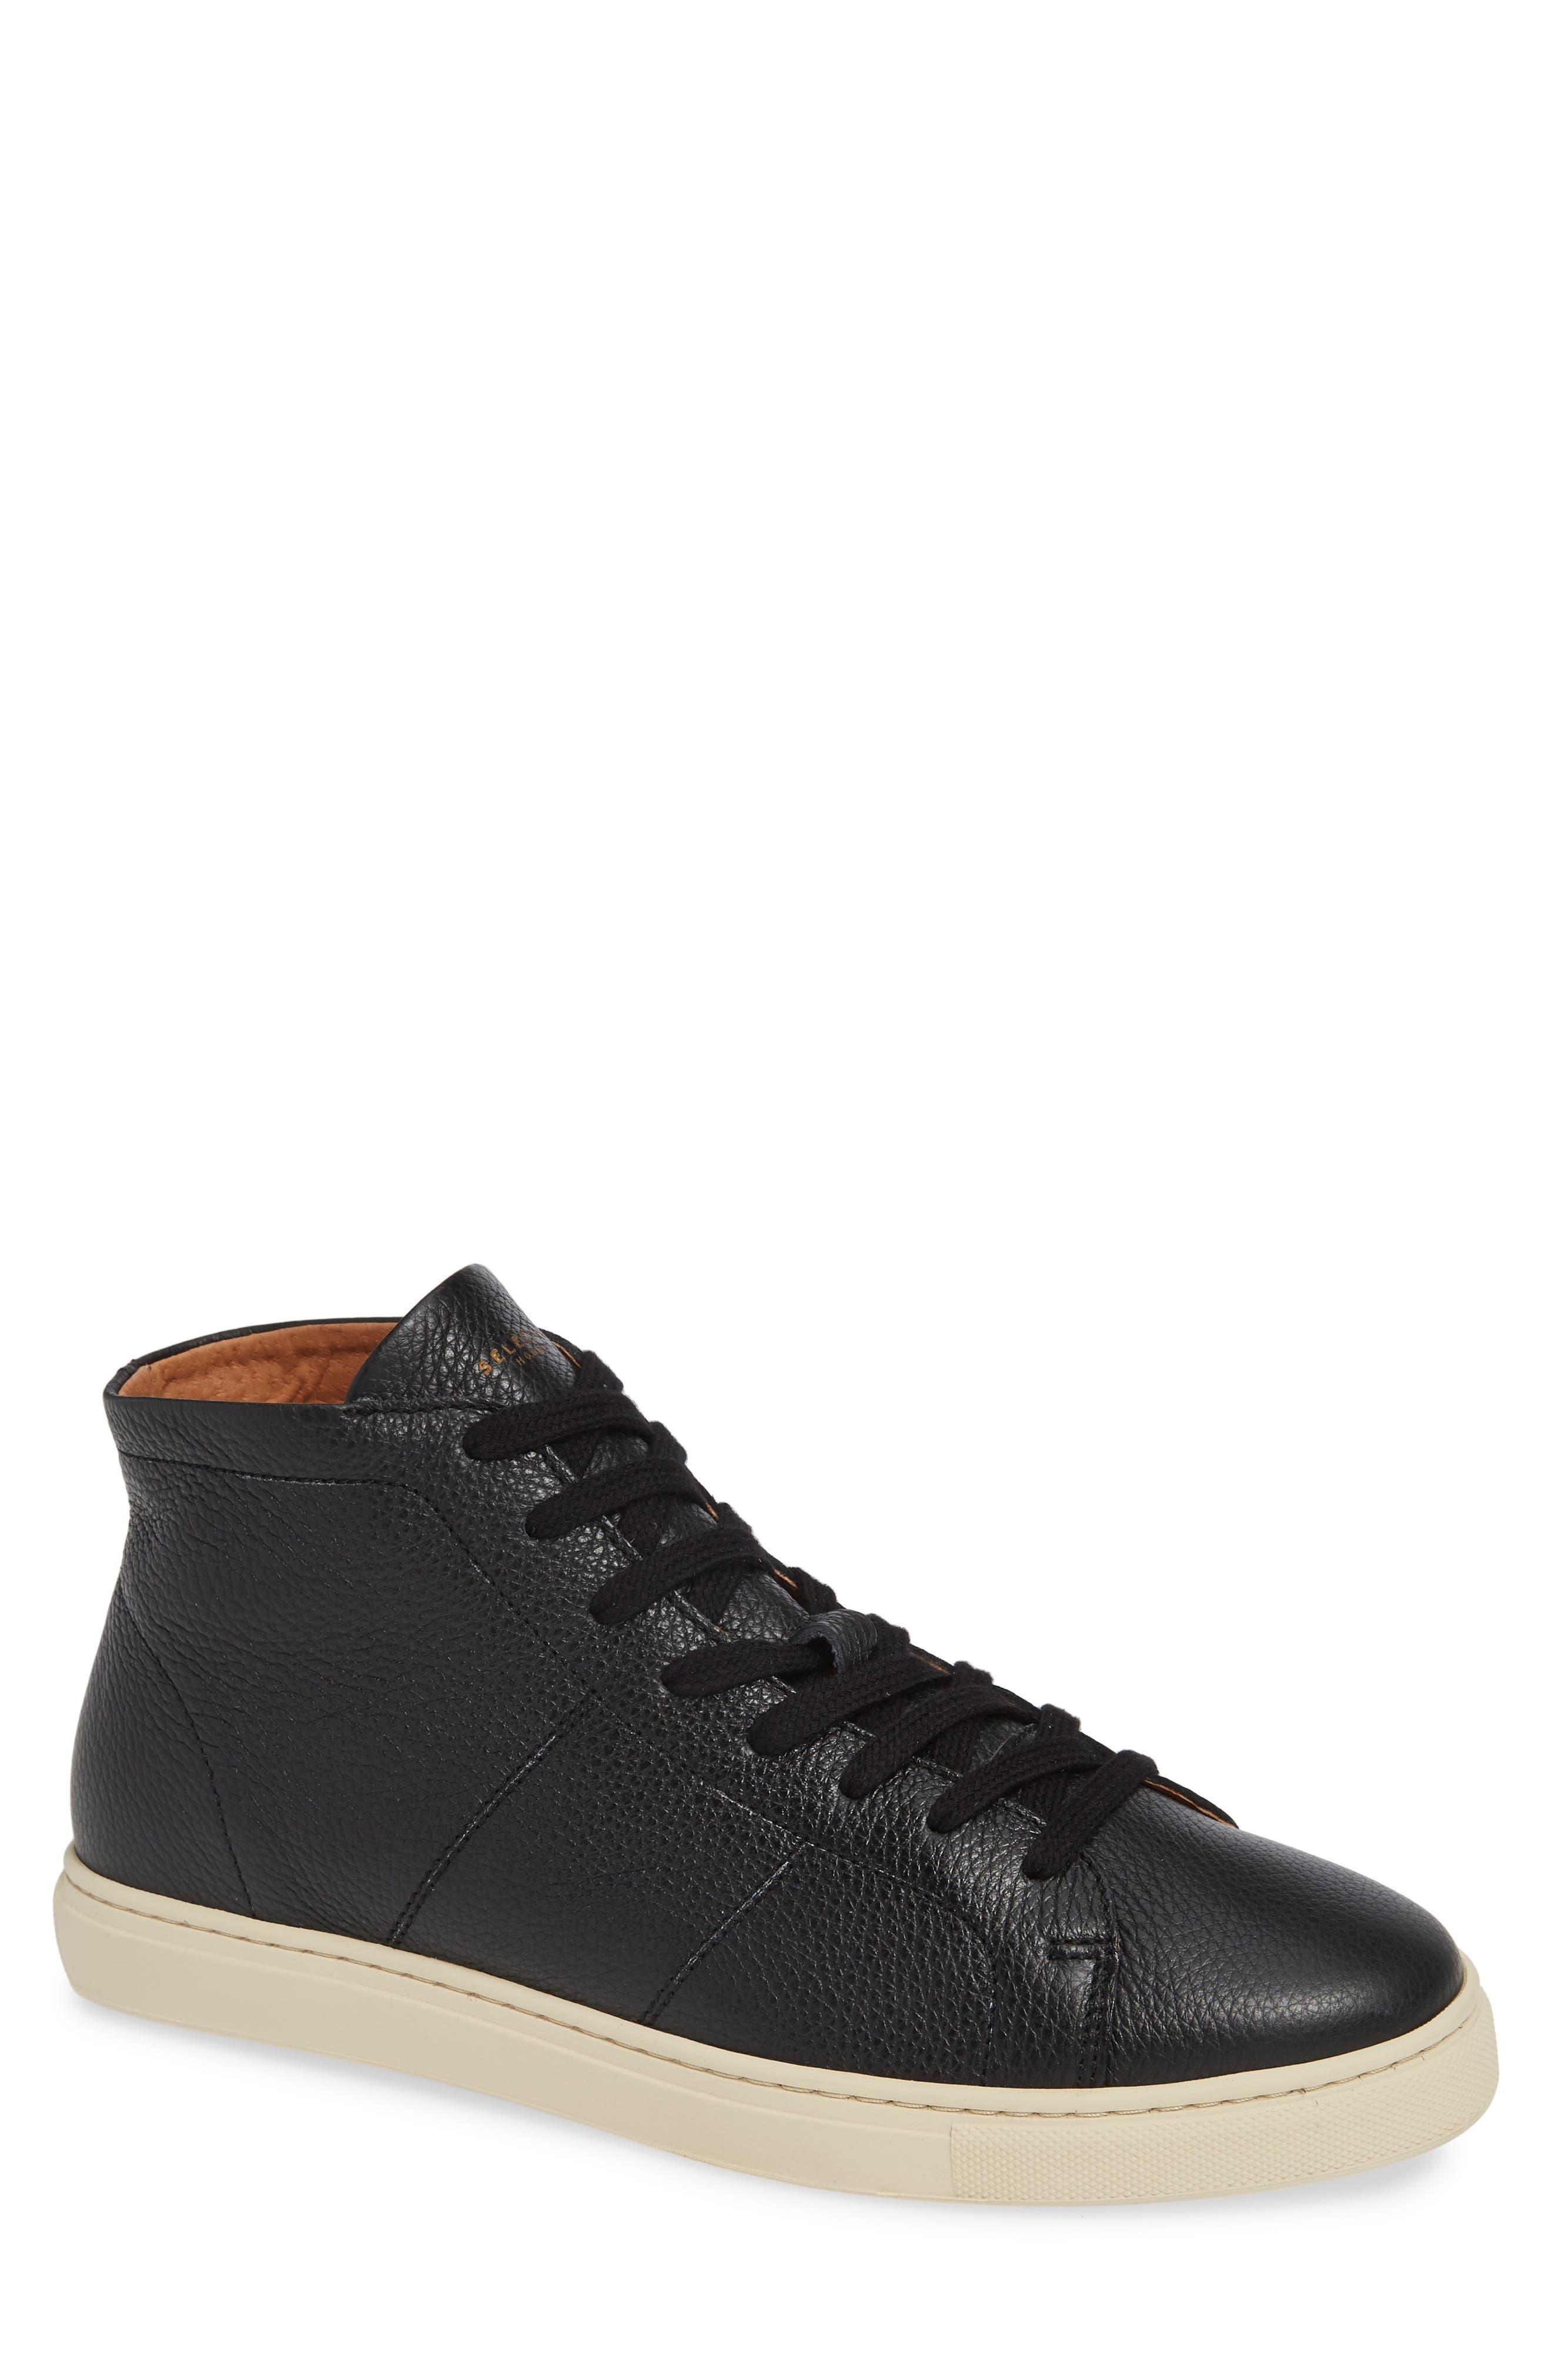 David Sneaker,                             Main thumbnail 1, color,                             BLACK